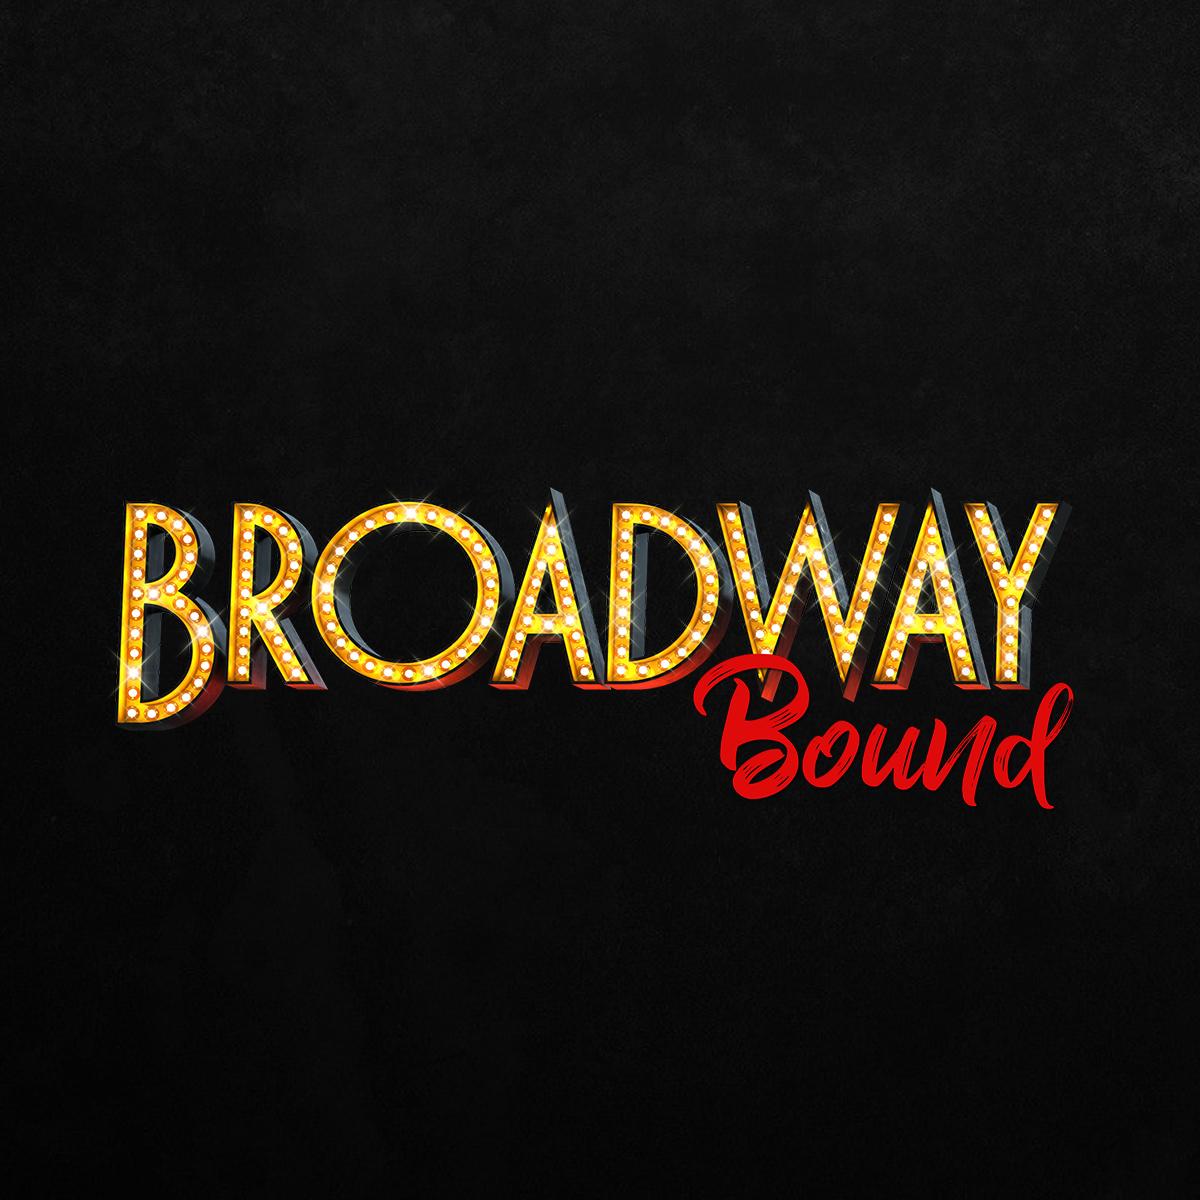 Broadway Bound banner image